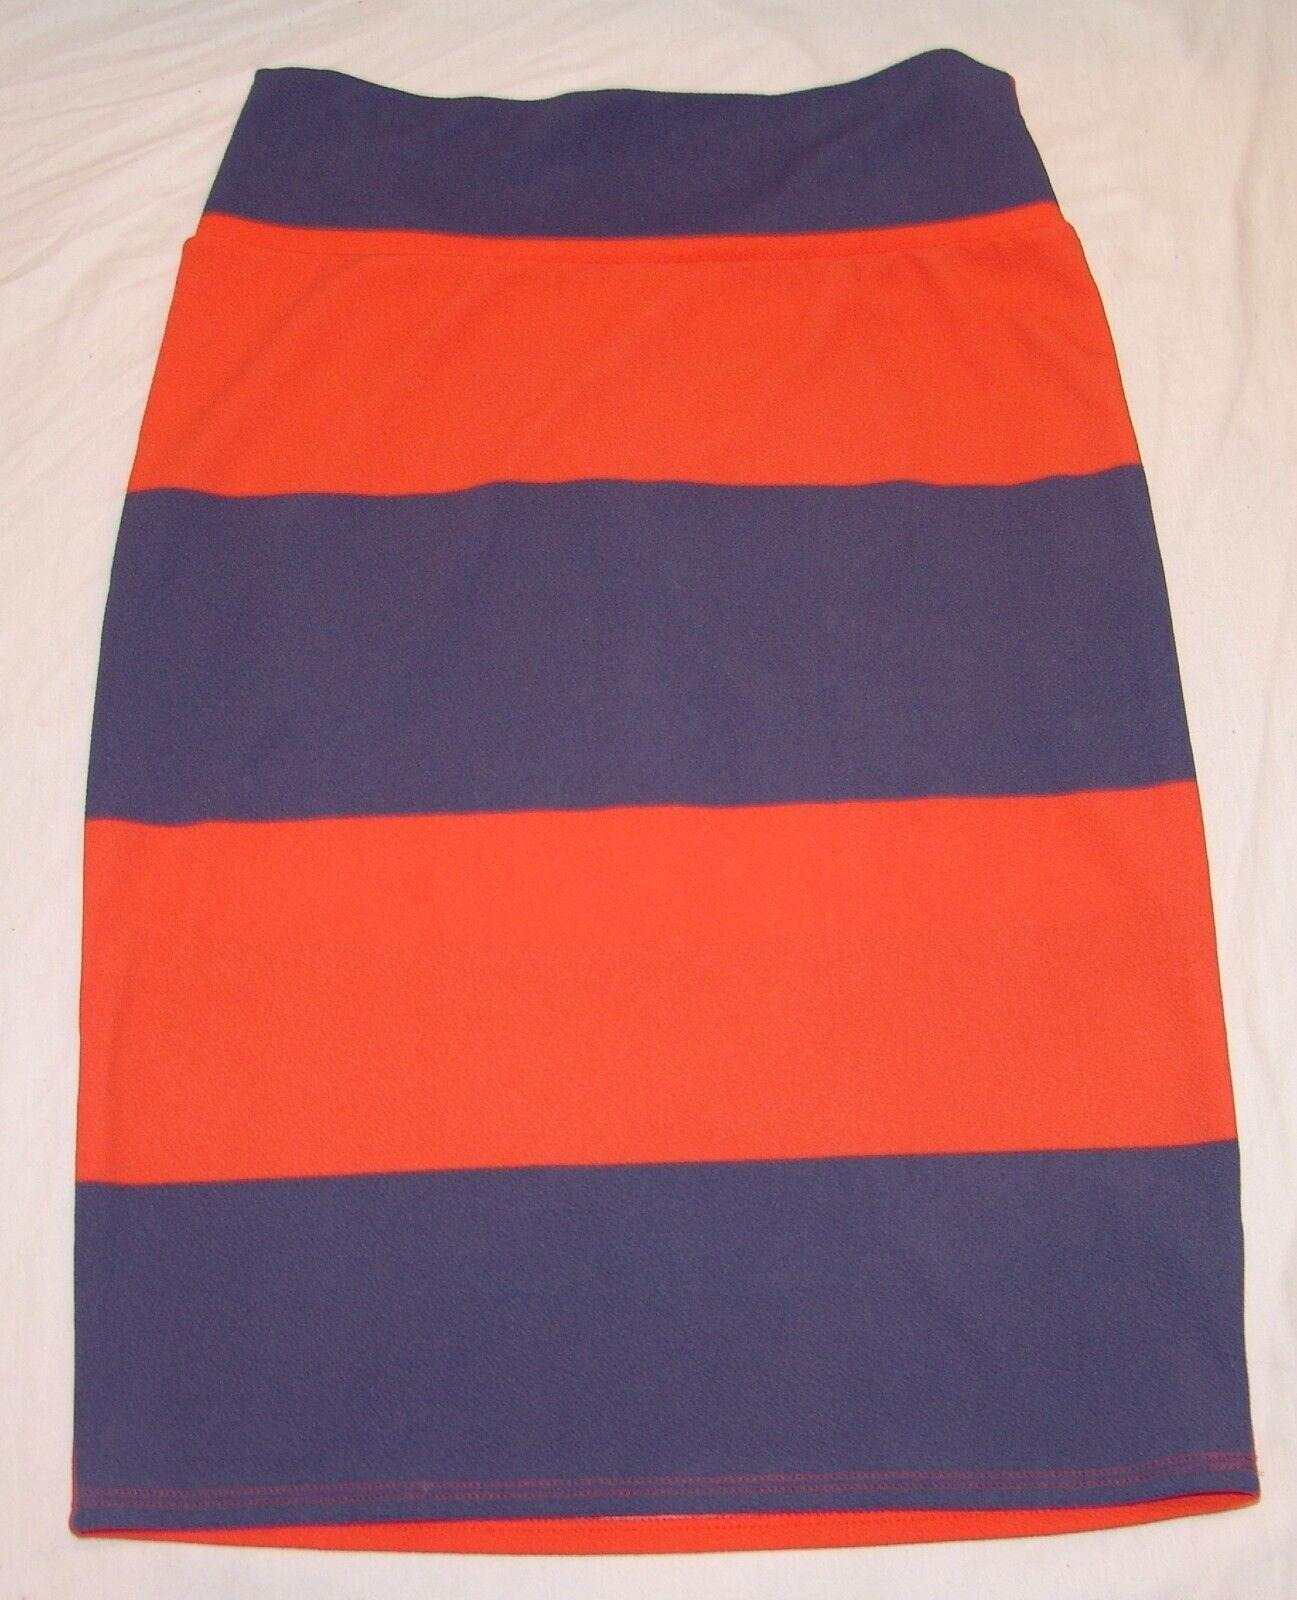 LuLaroe Simply Comfortable Skirt L Womens orange bluee Striped Straight Pencil